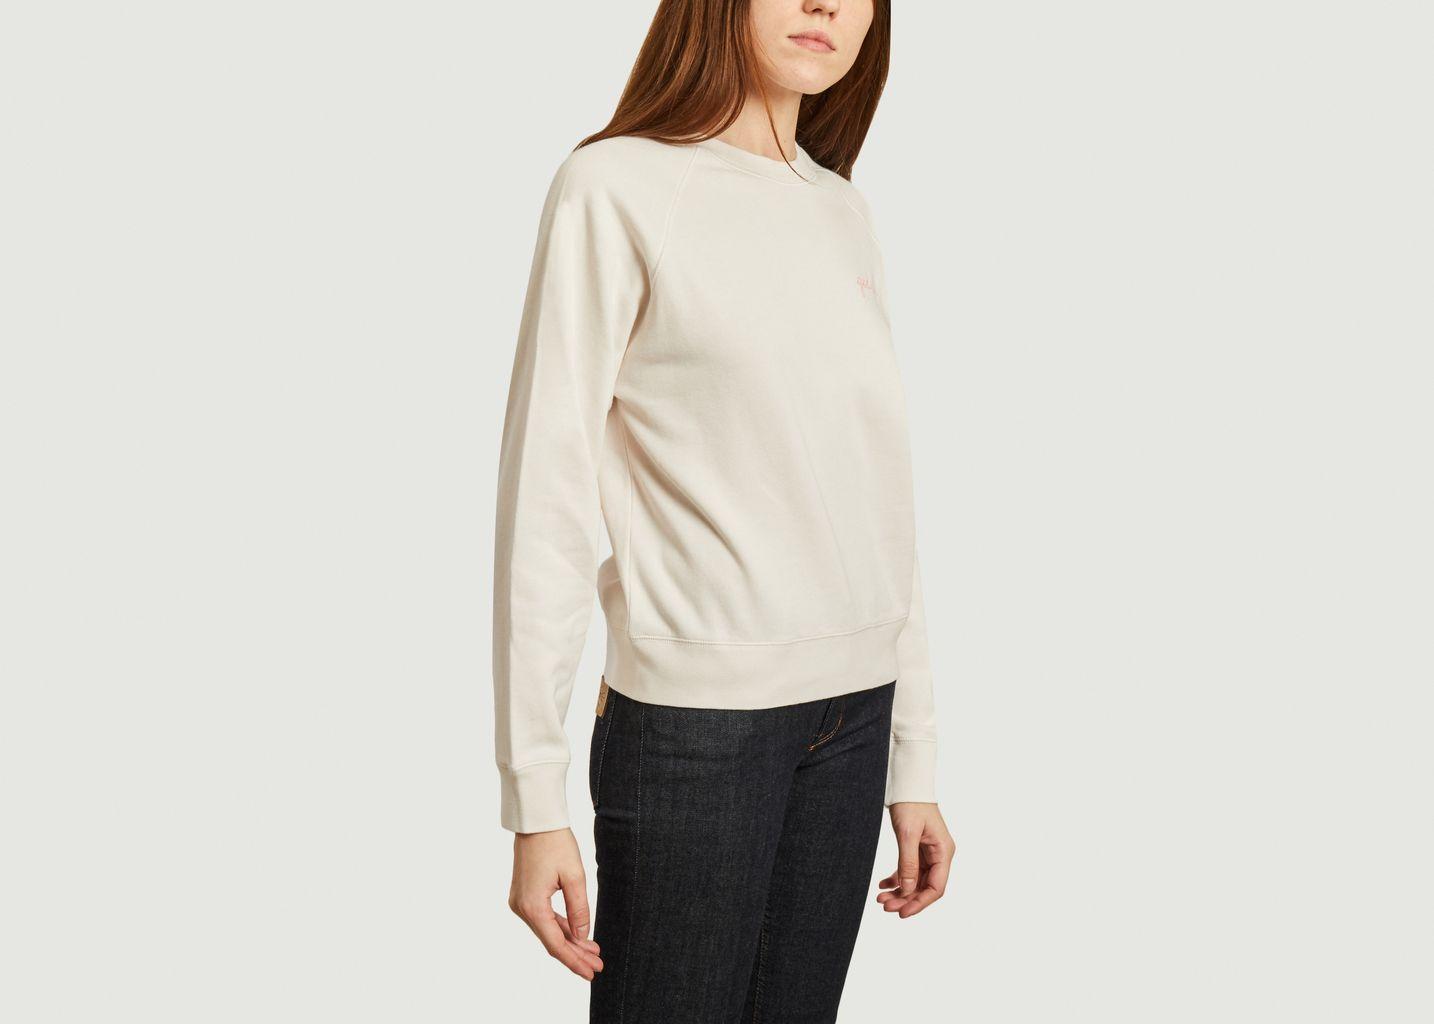 Sweatshirt Good Vibe - Maison Labiche